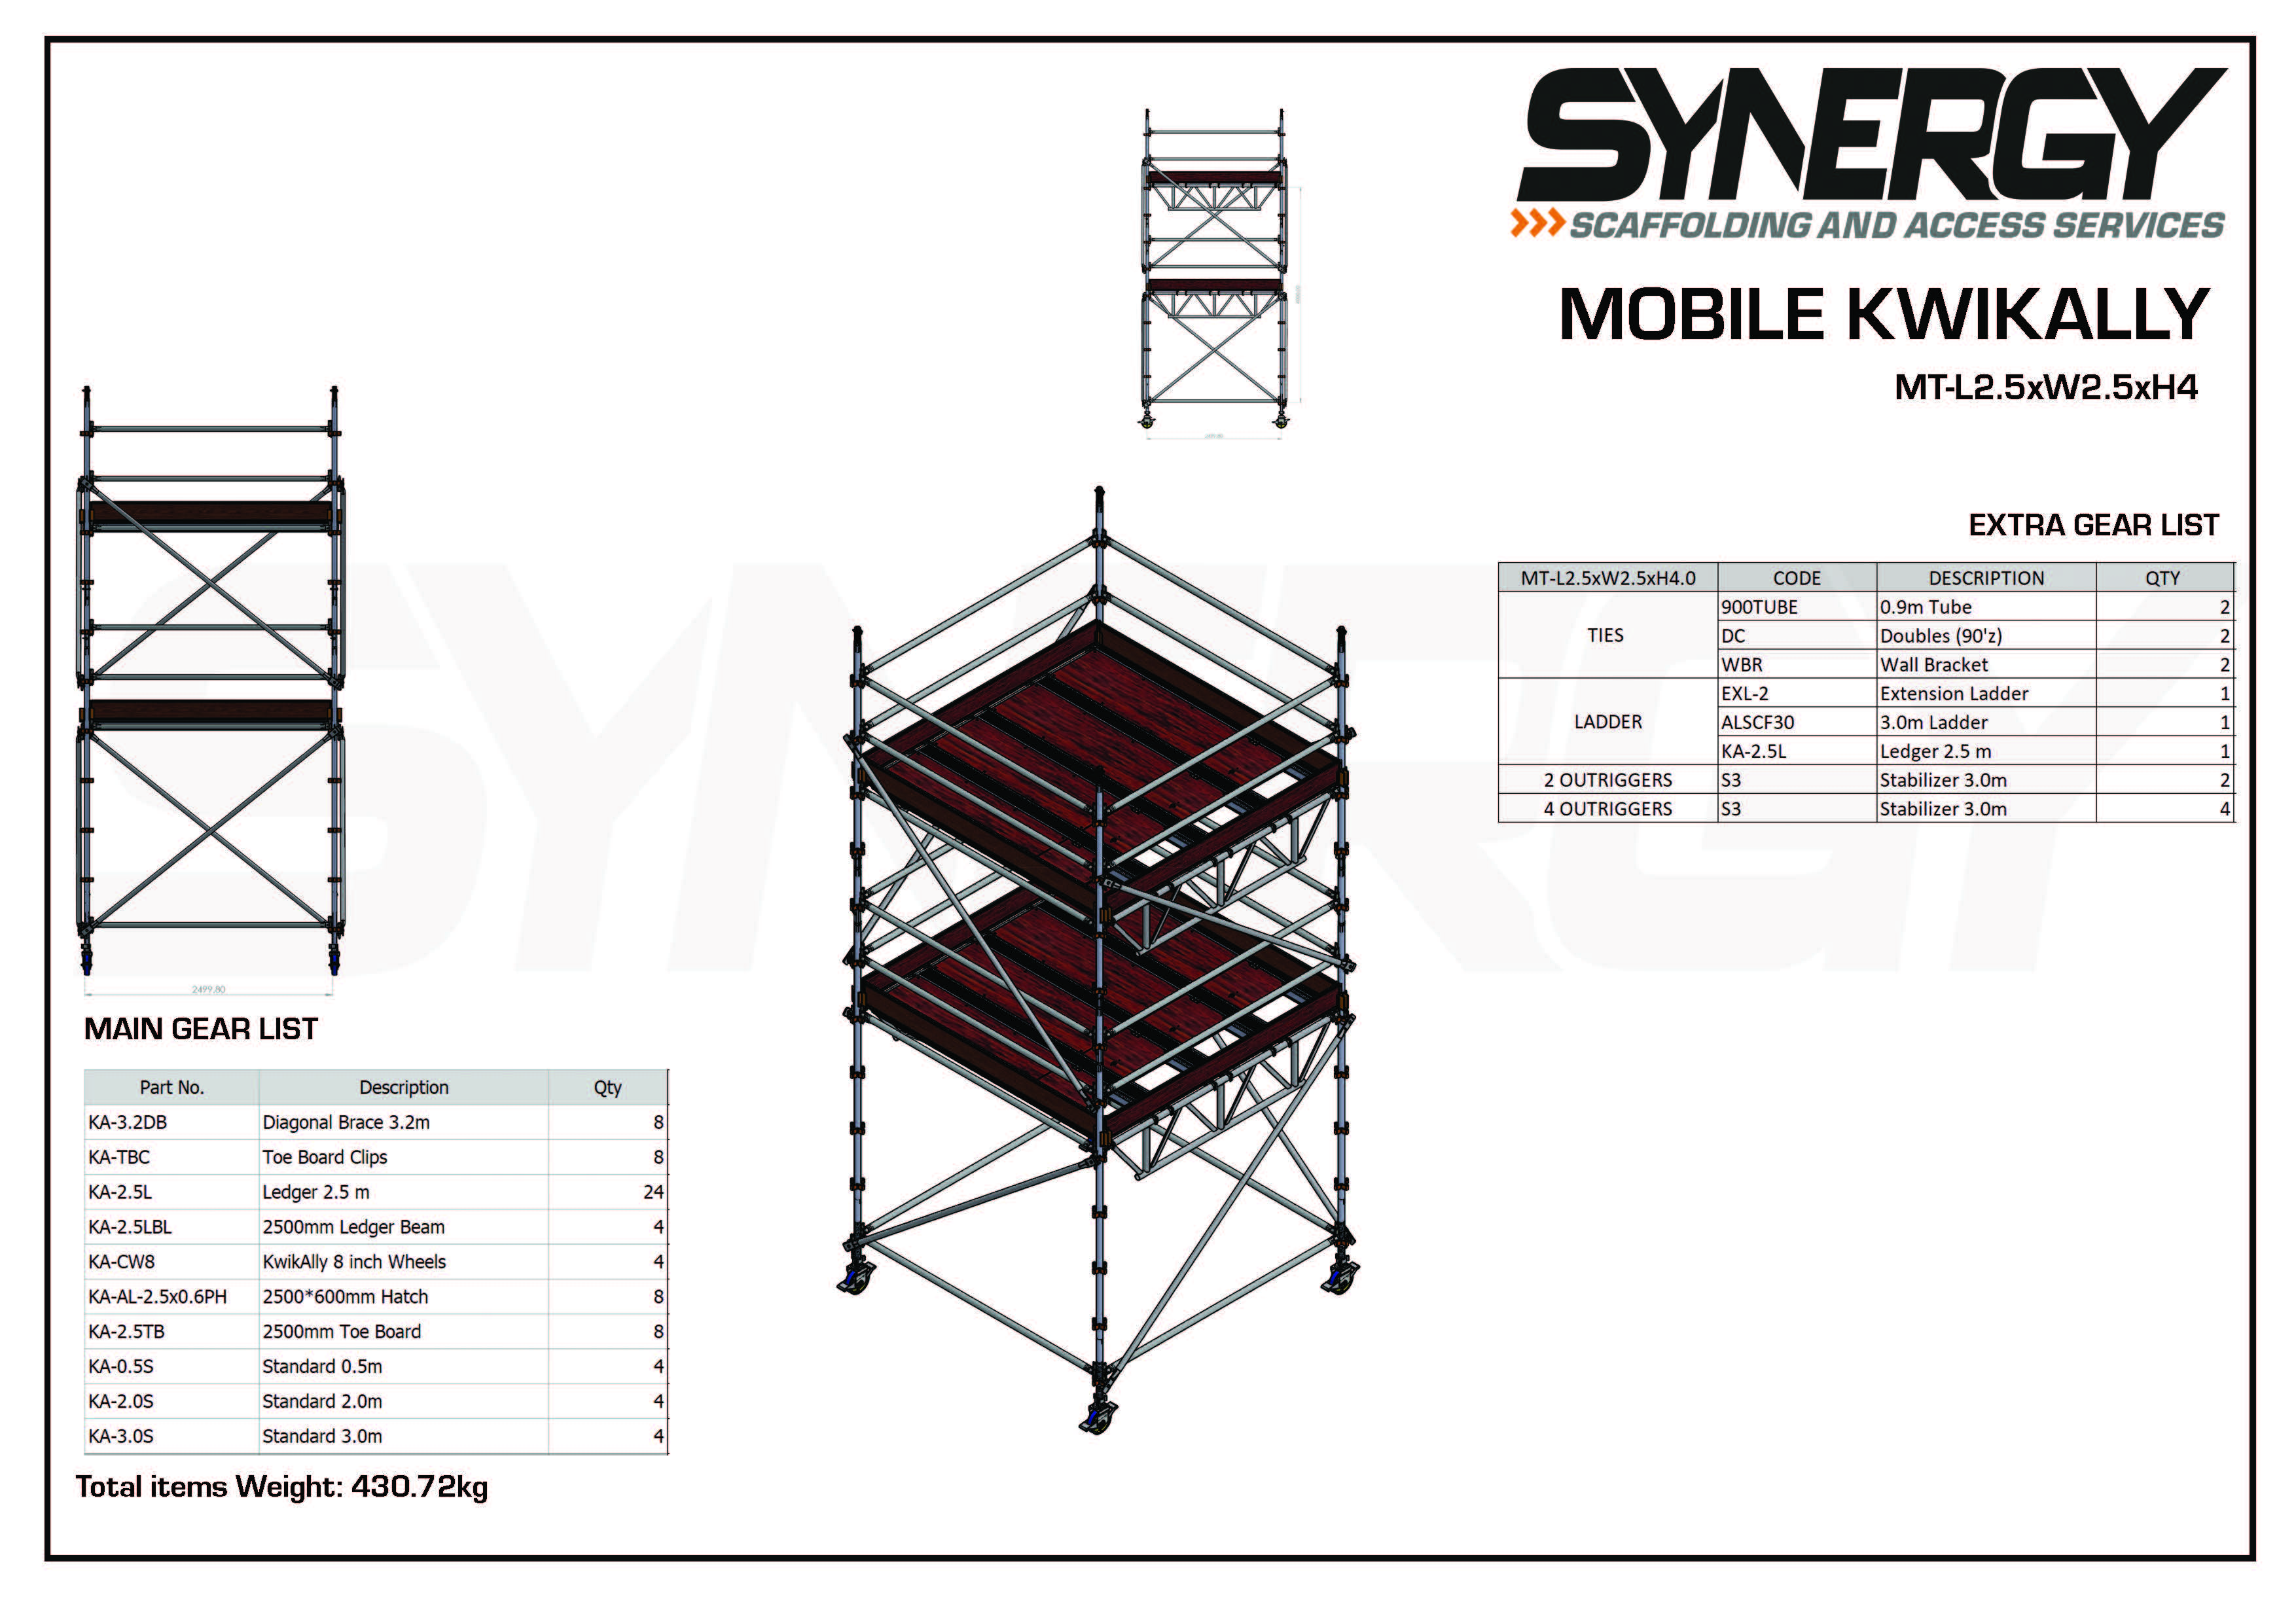 Kwikally Mobile 2.5m x 2.5m x 4m(Height)